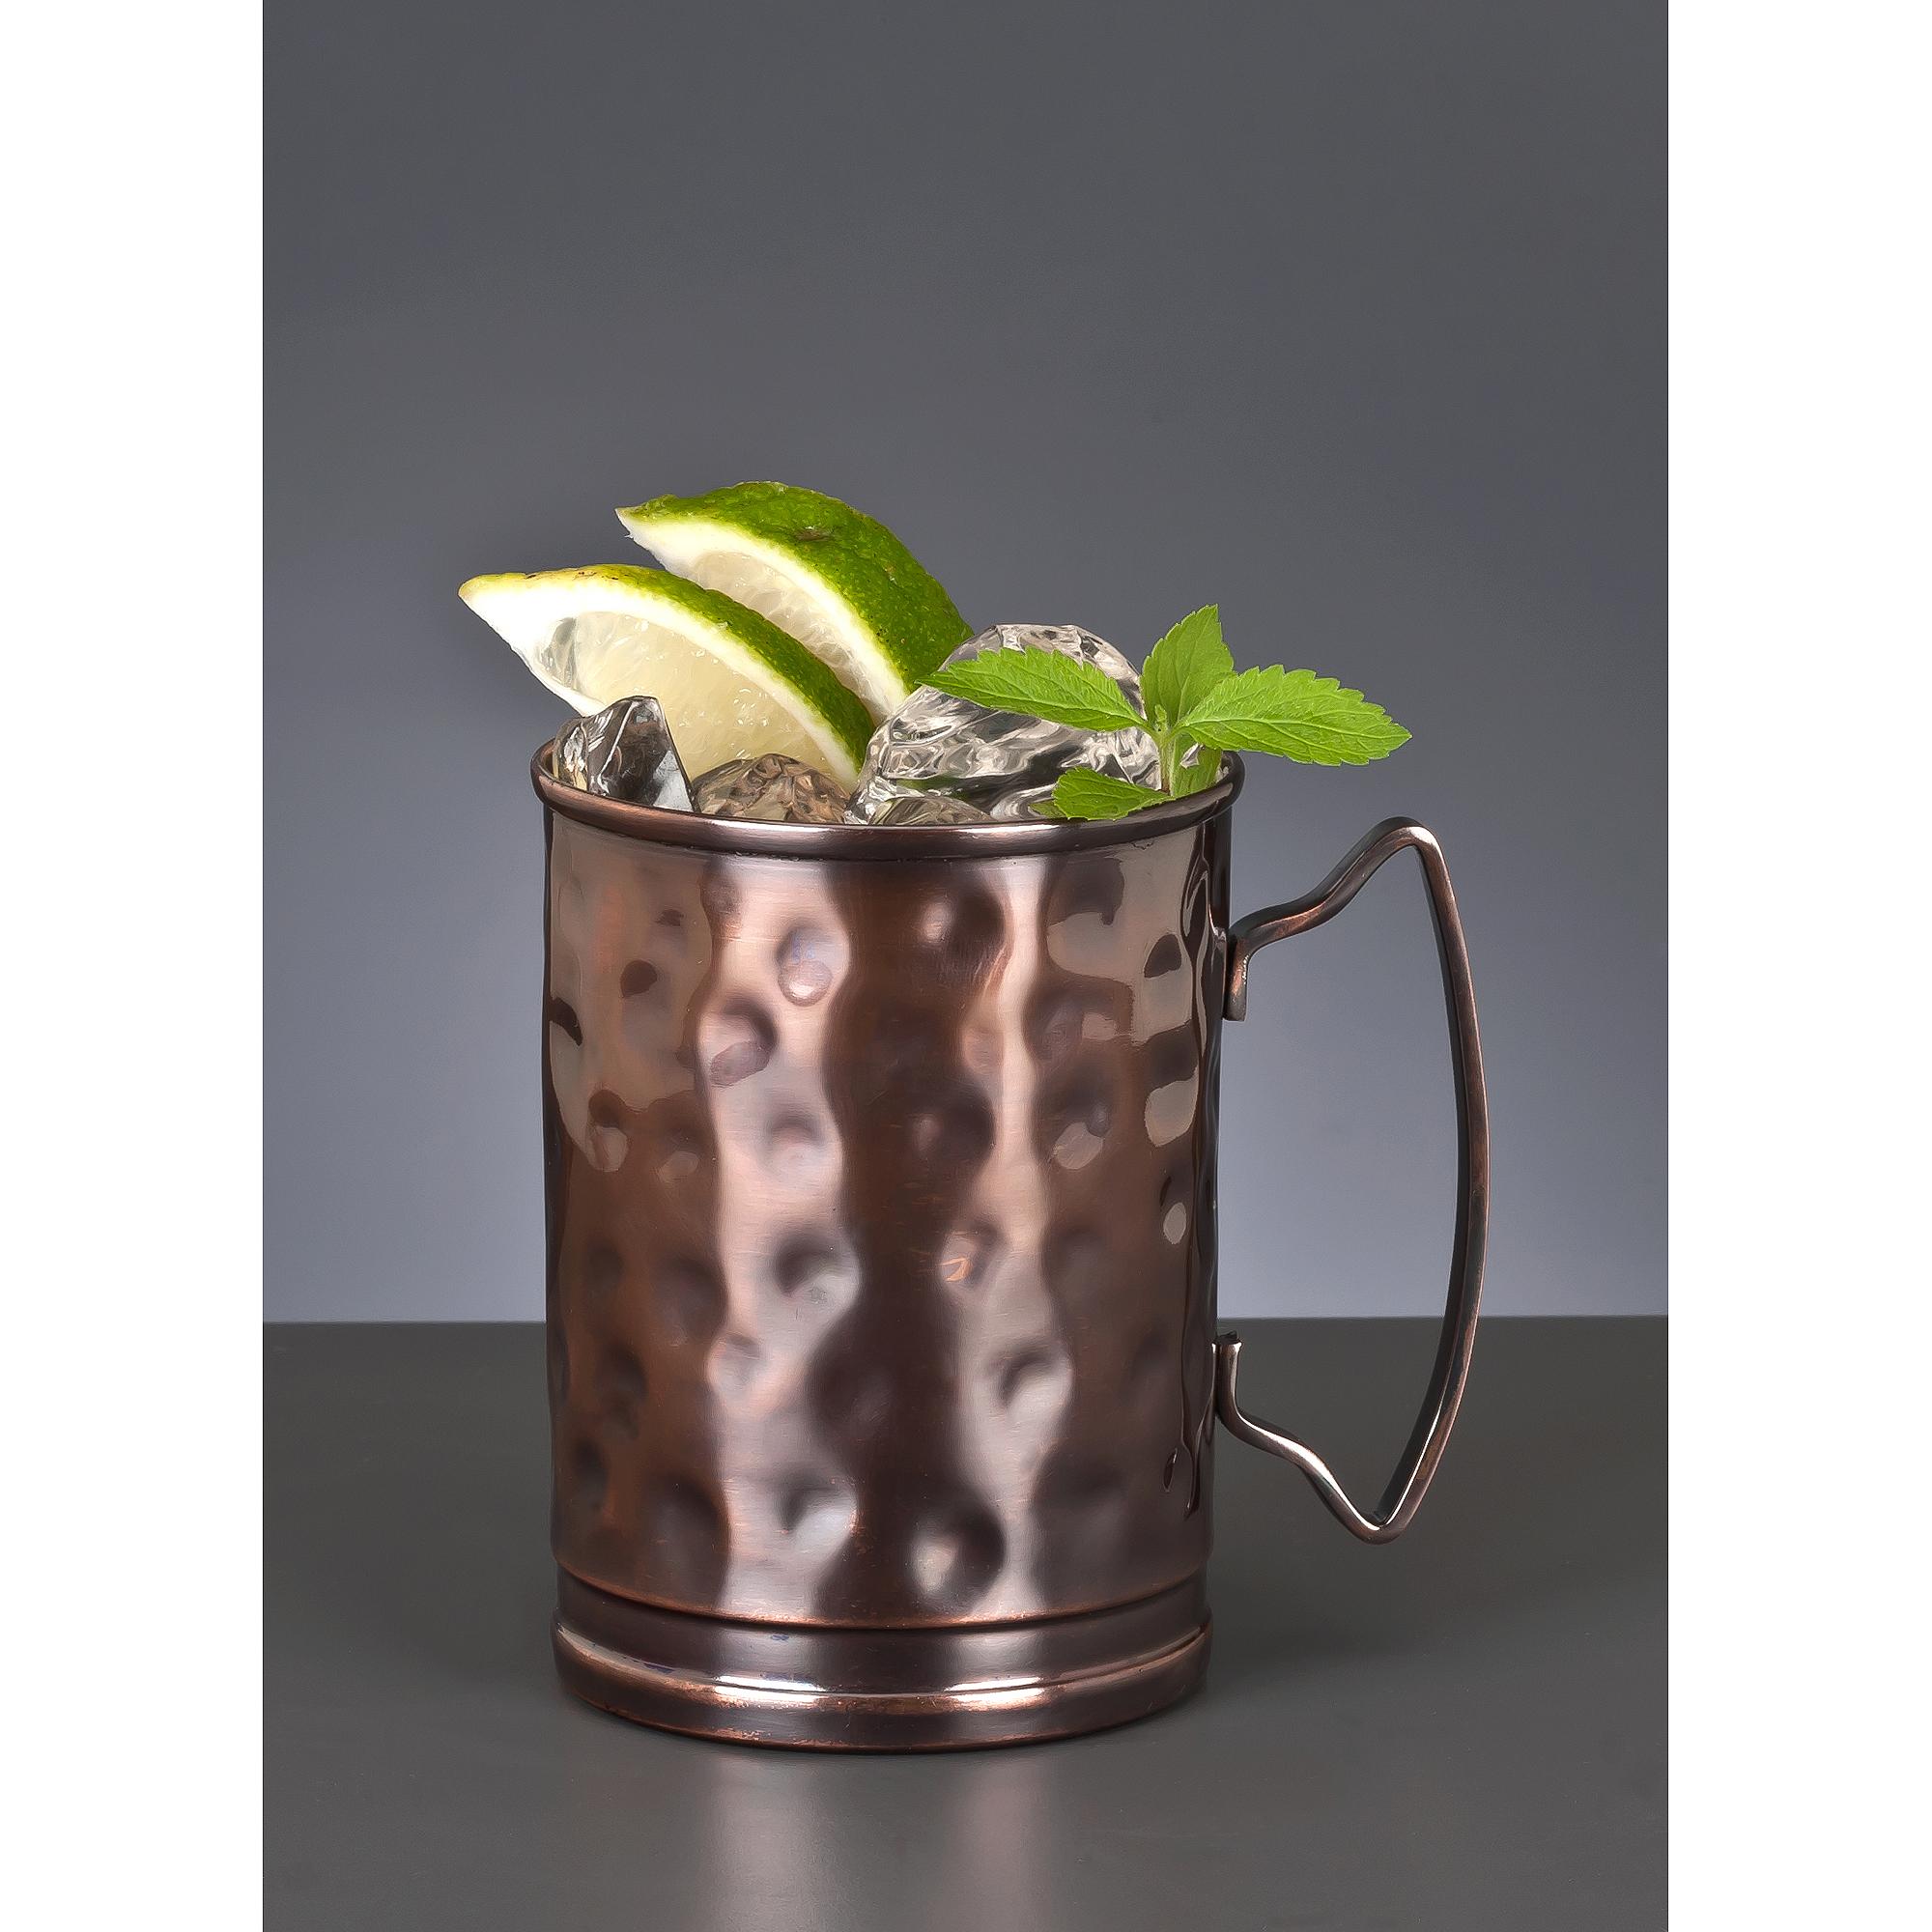 Libbey Moscow Mule Mug 2-Piece Set, Bronze